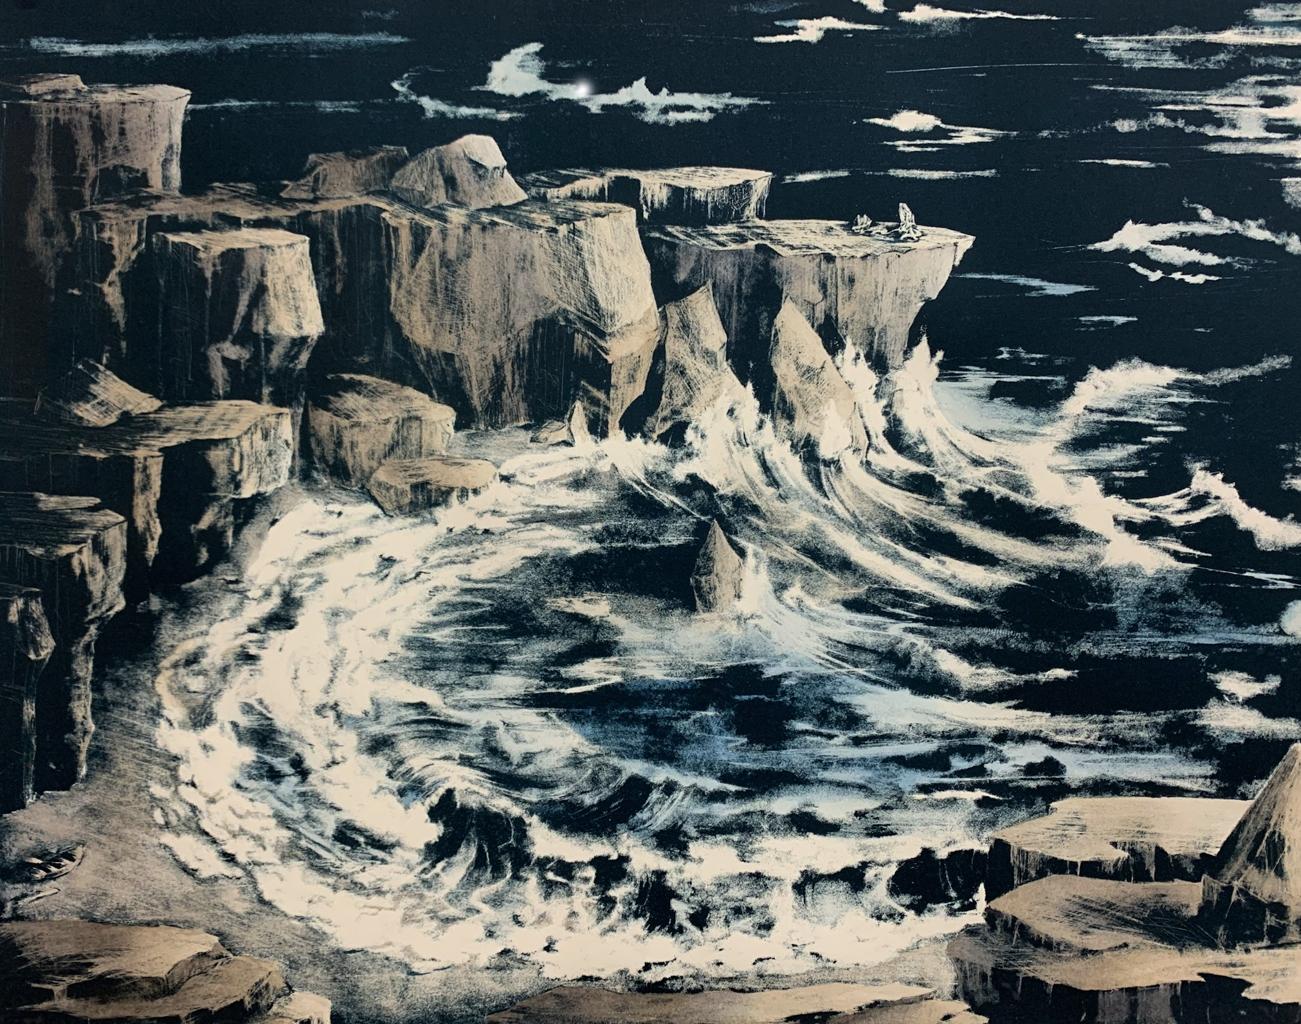 Claire Gustafson, Contemplate, Lithograph Print & Watercolor, 2021, 15.75 x 20